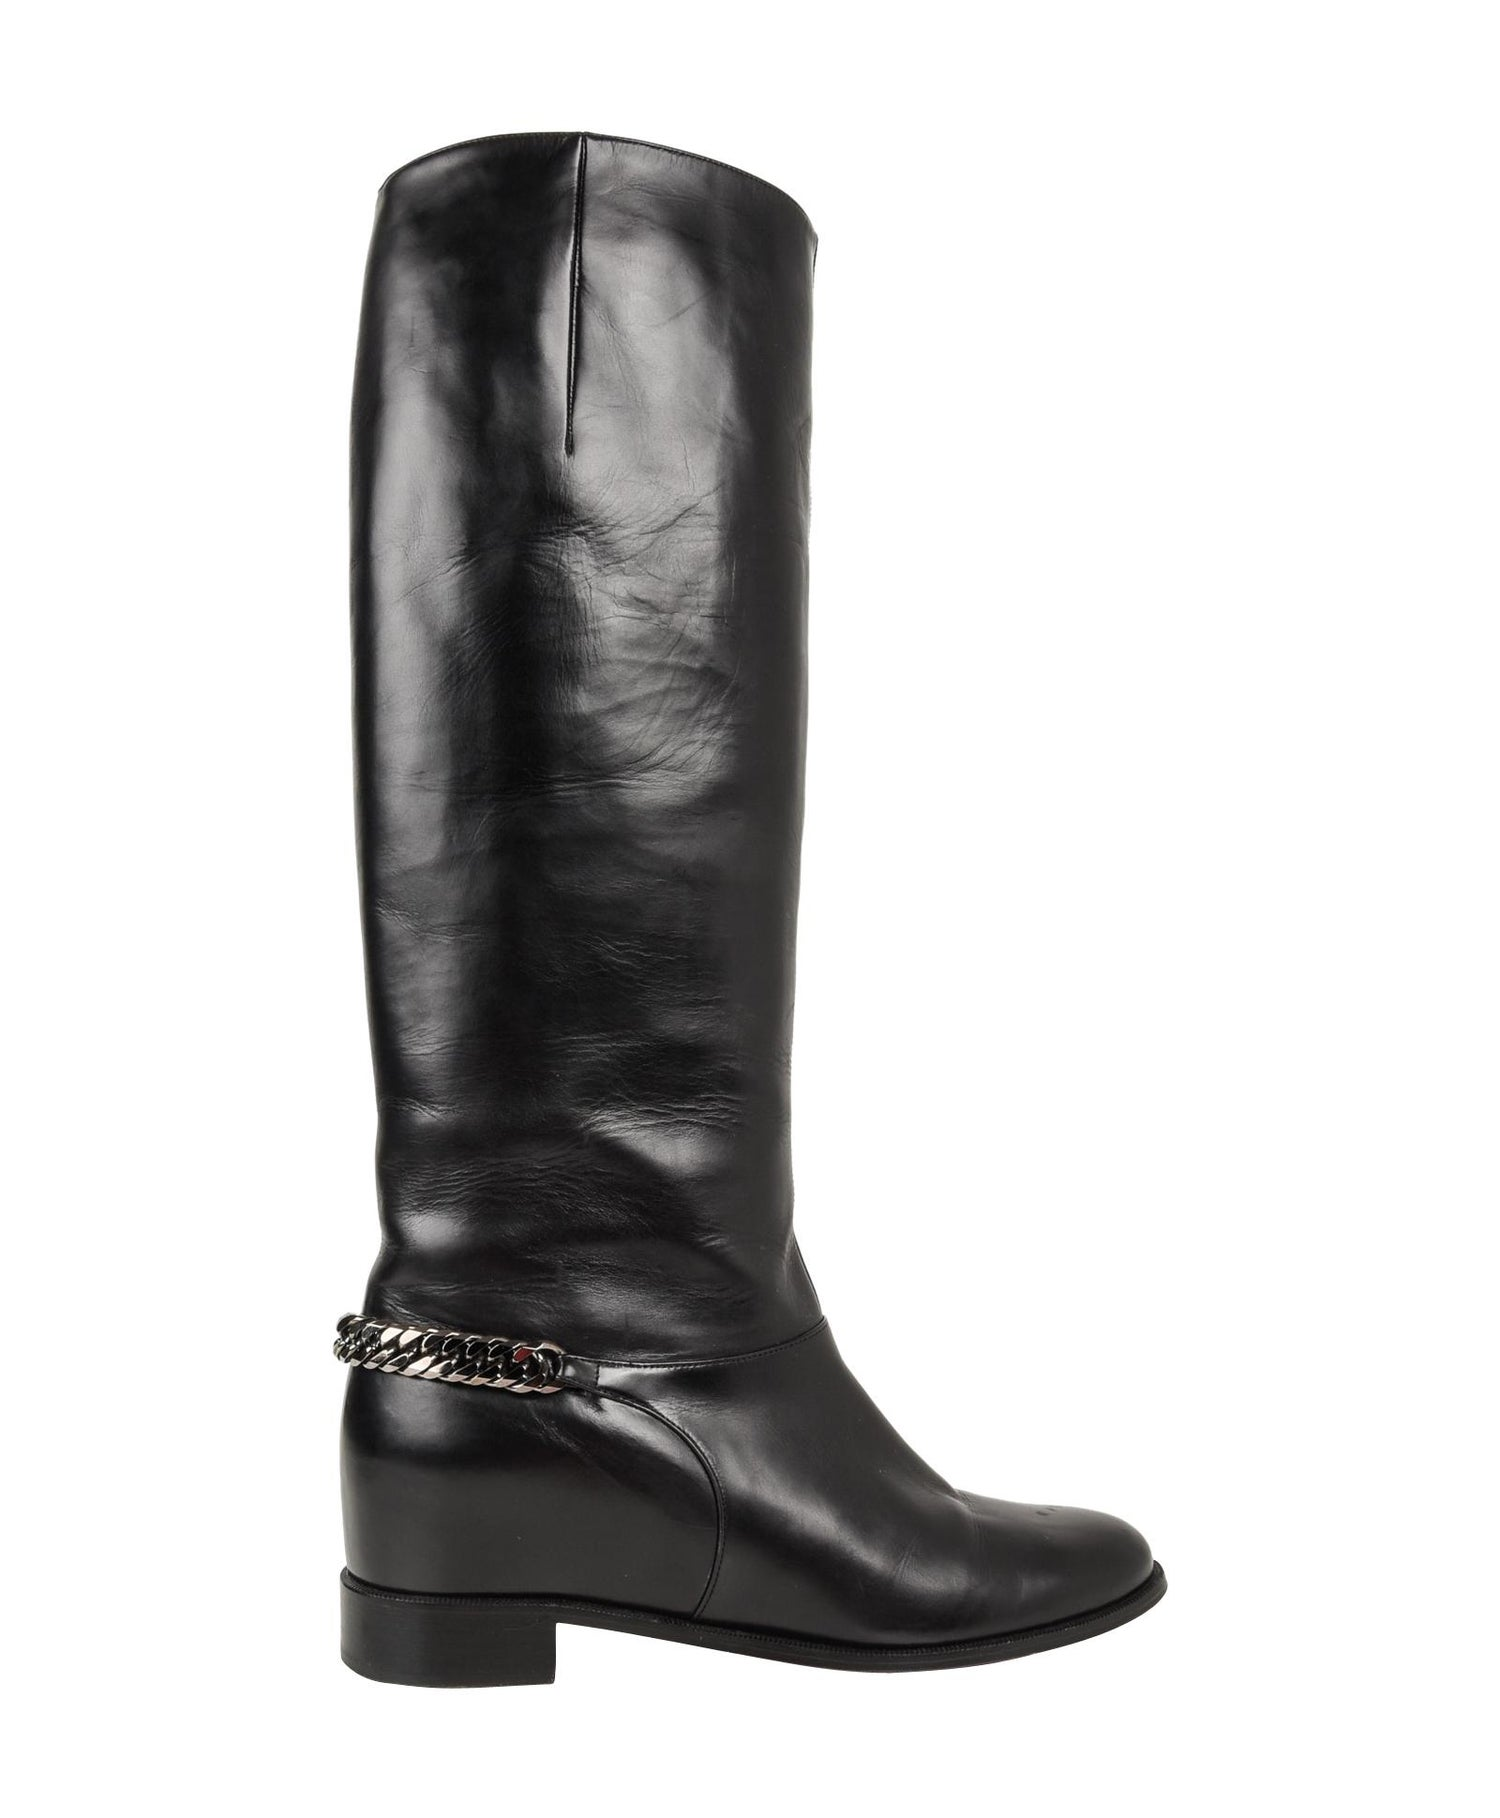 brand new e0a00 d5c65 Christian Louboutin Boot Black Cate Flat Knee High Chain Detail 39 / 9